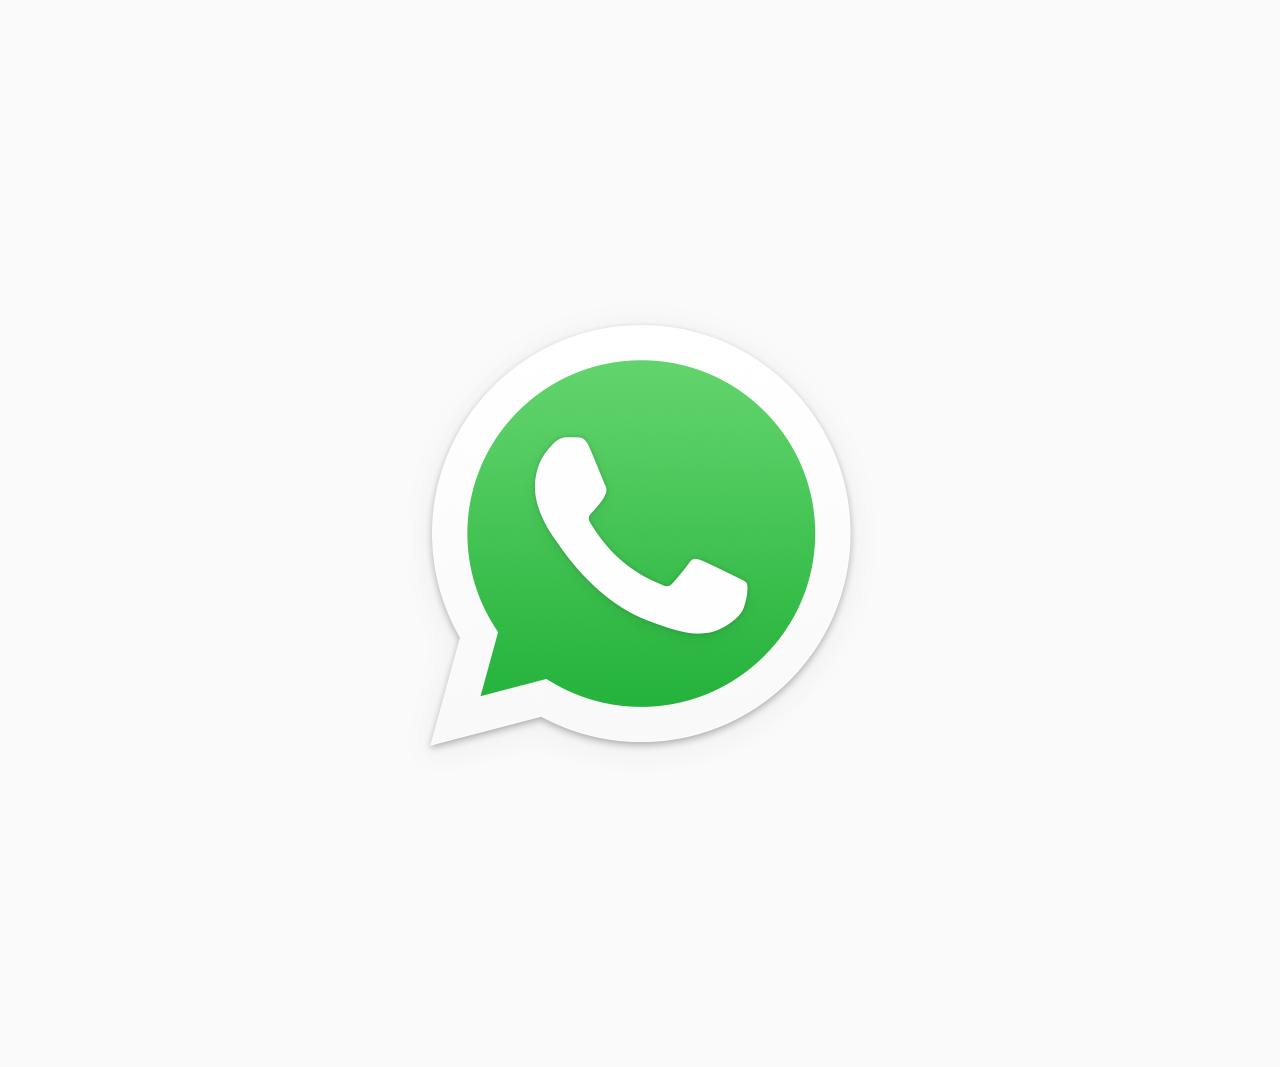 Resultado de imagen para logo whatsapp jpg